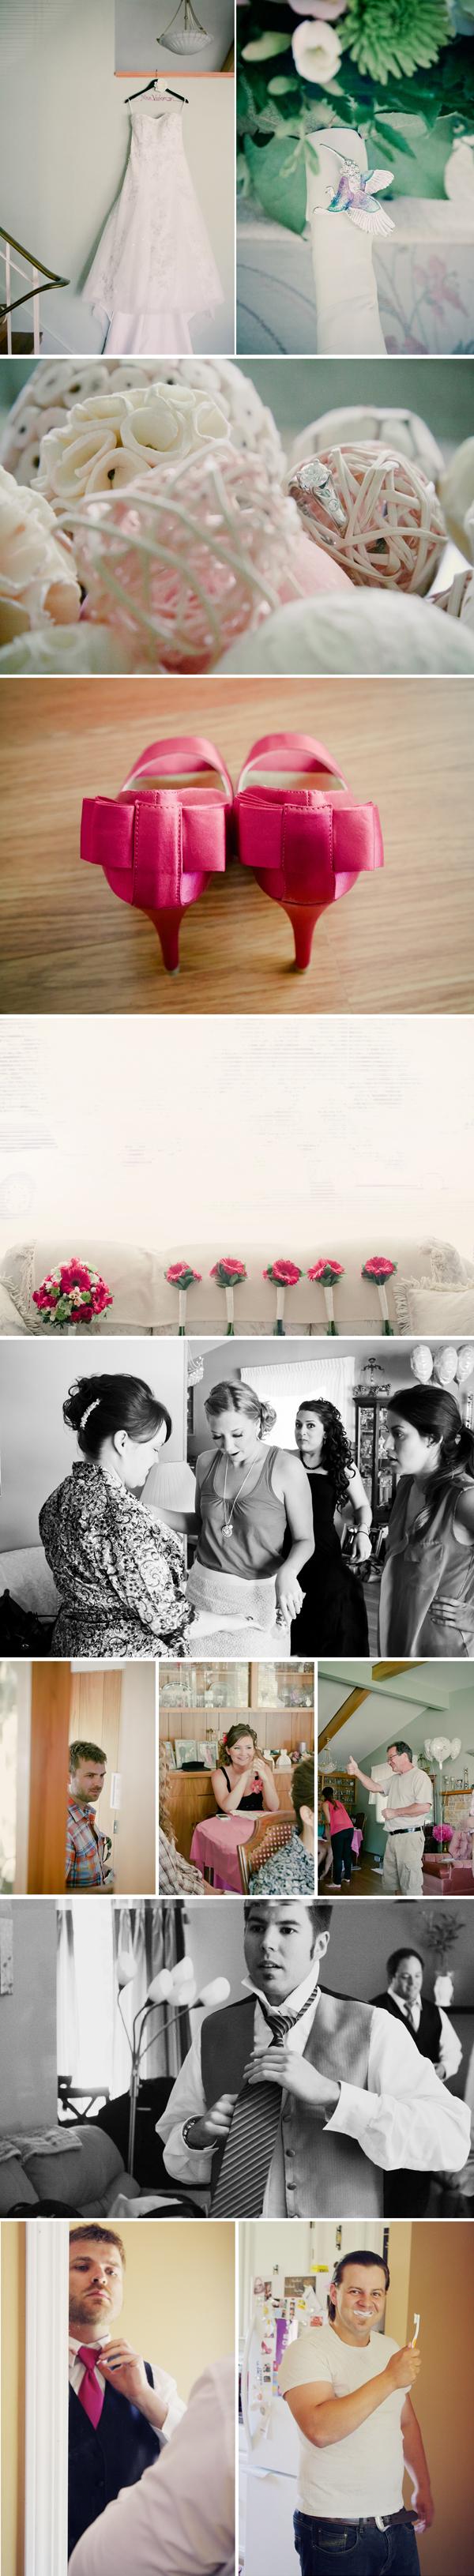 carey shaw_regina wedding photographer_pammatt_blog_2.jpg